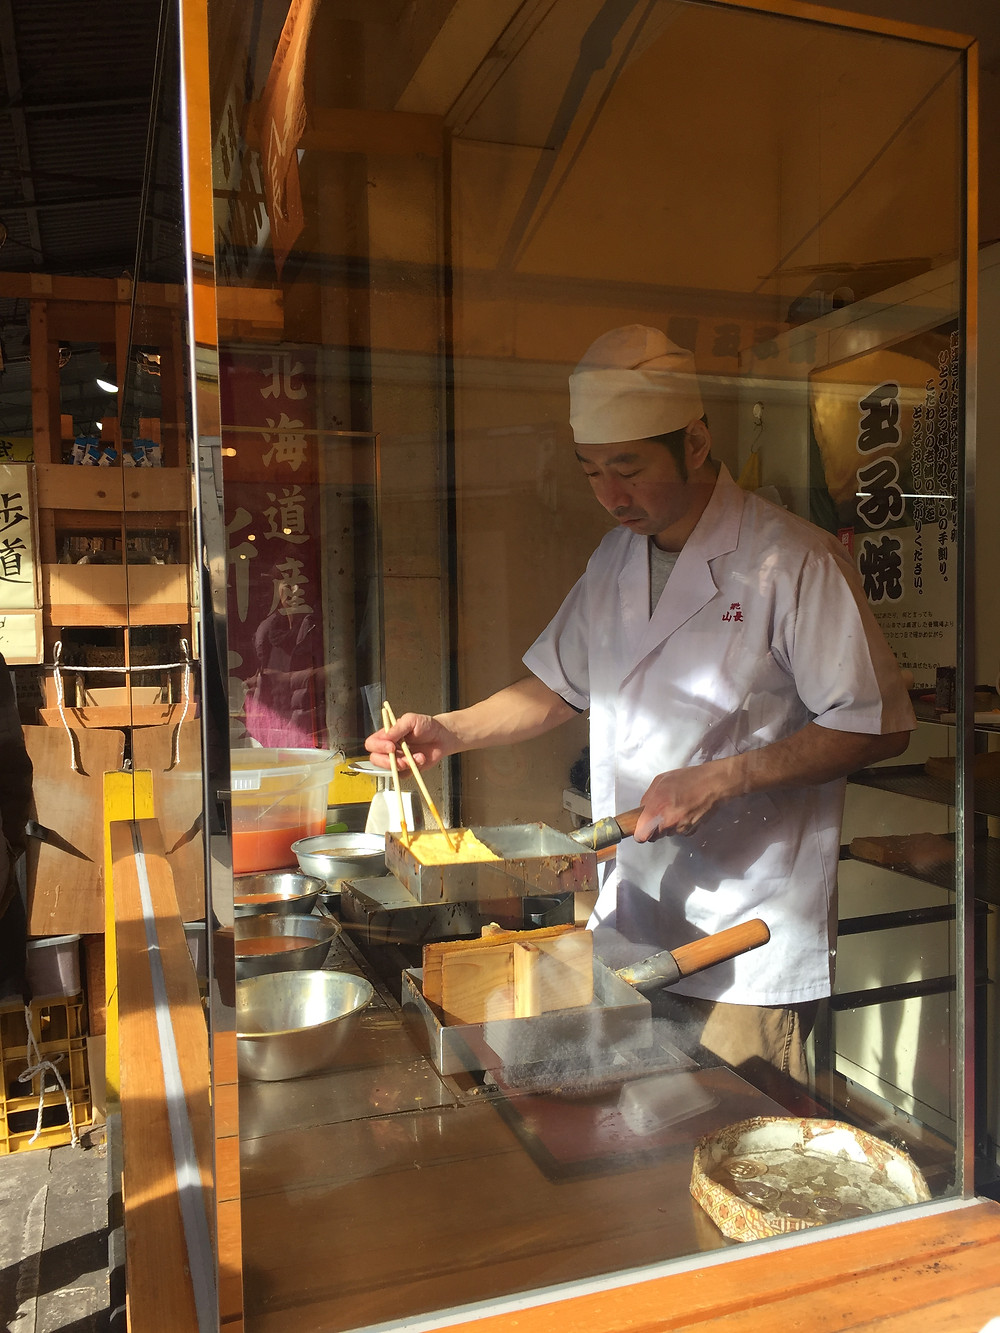 Tamagoyaki in the making - Ordinary Brussels